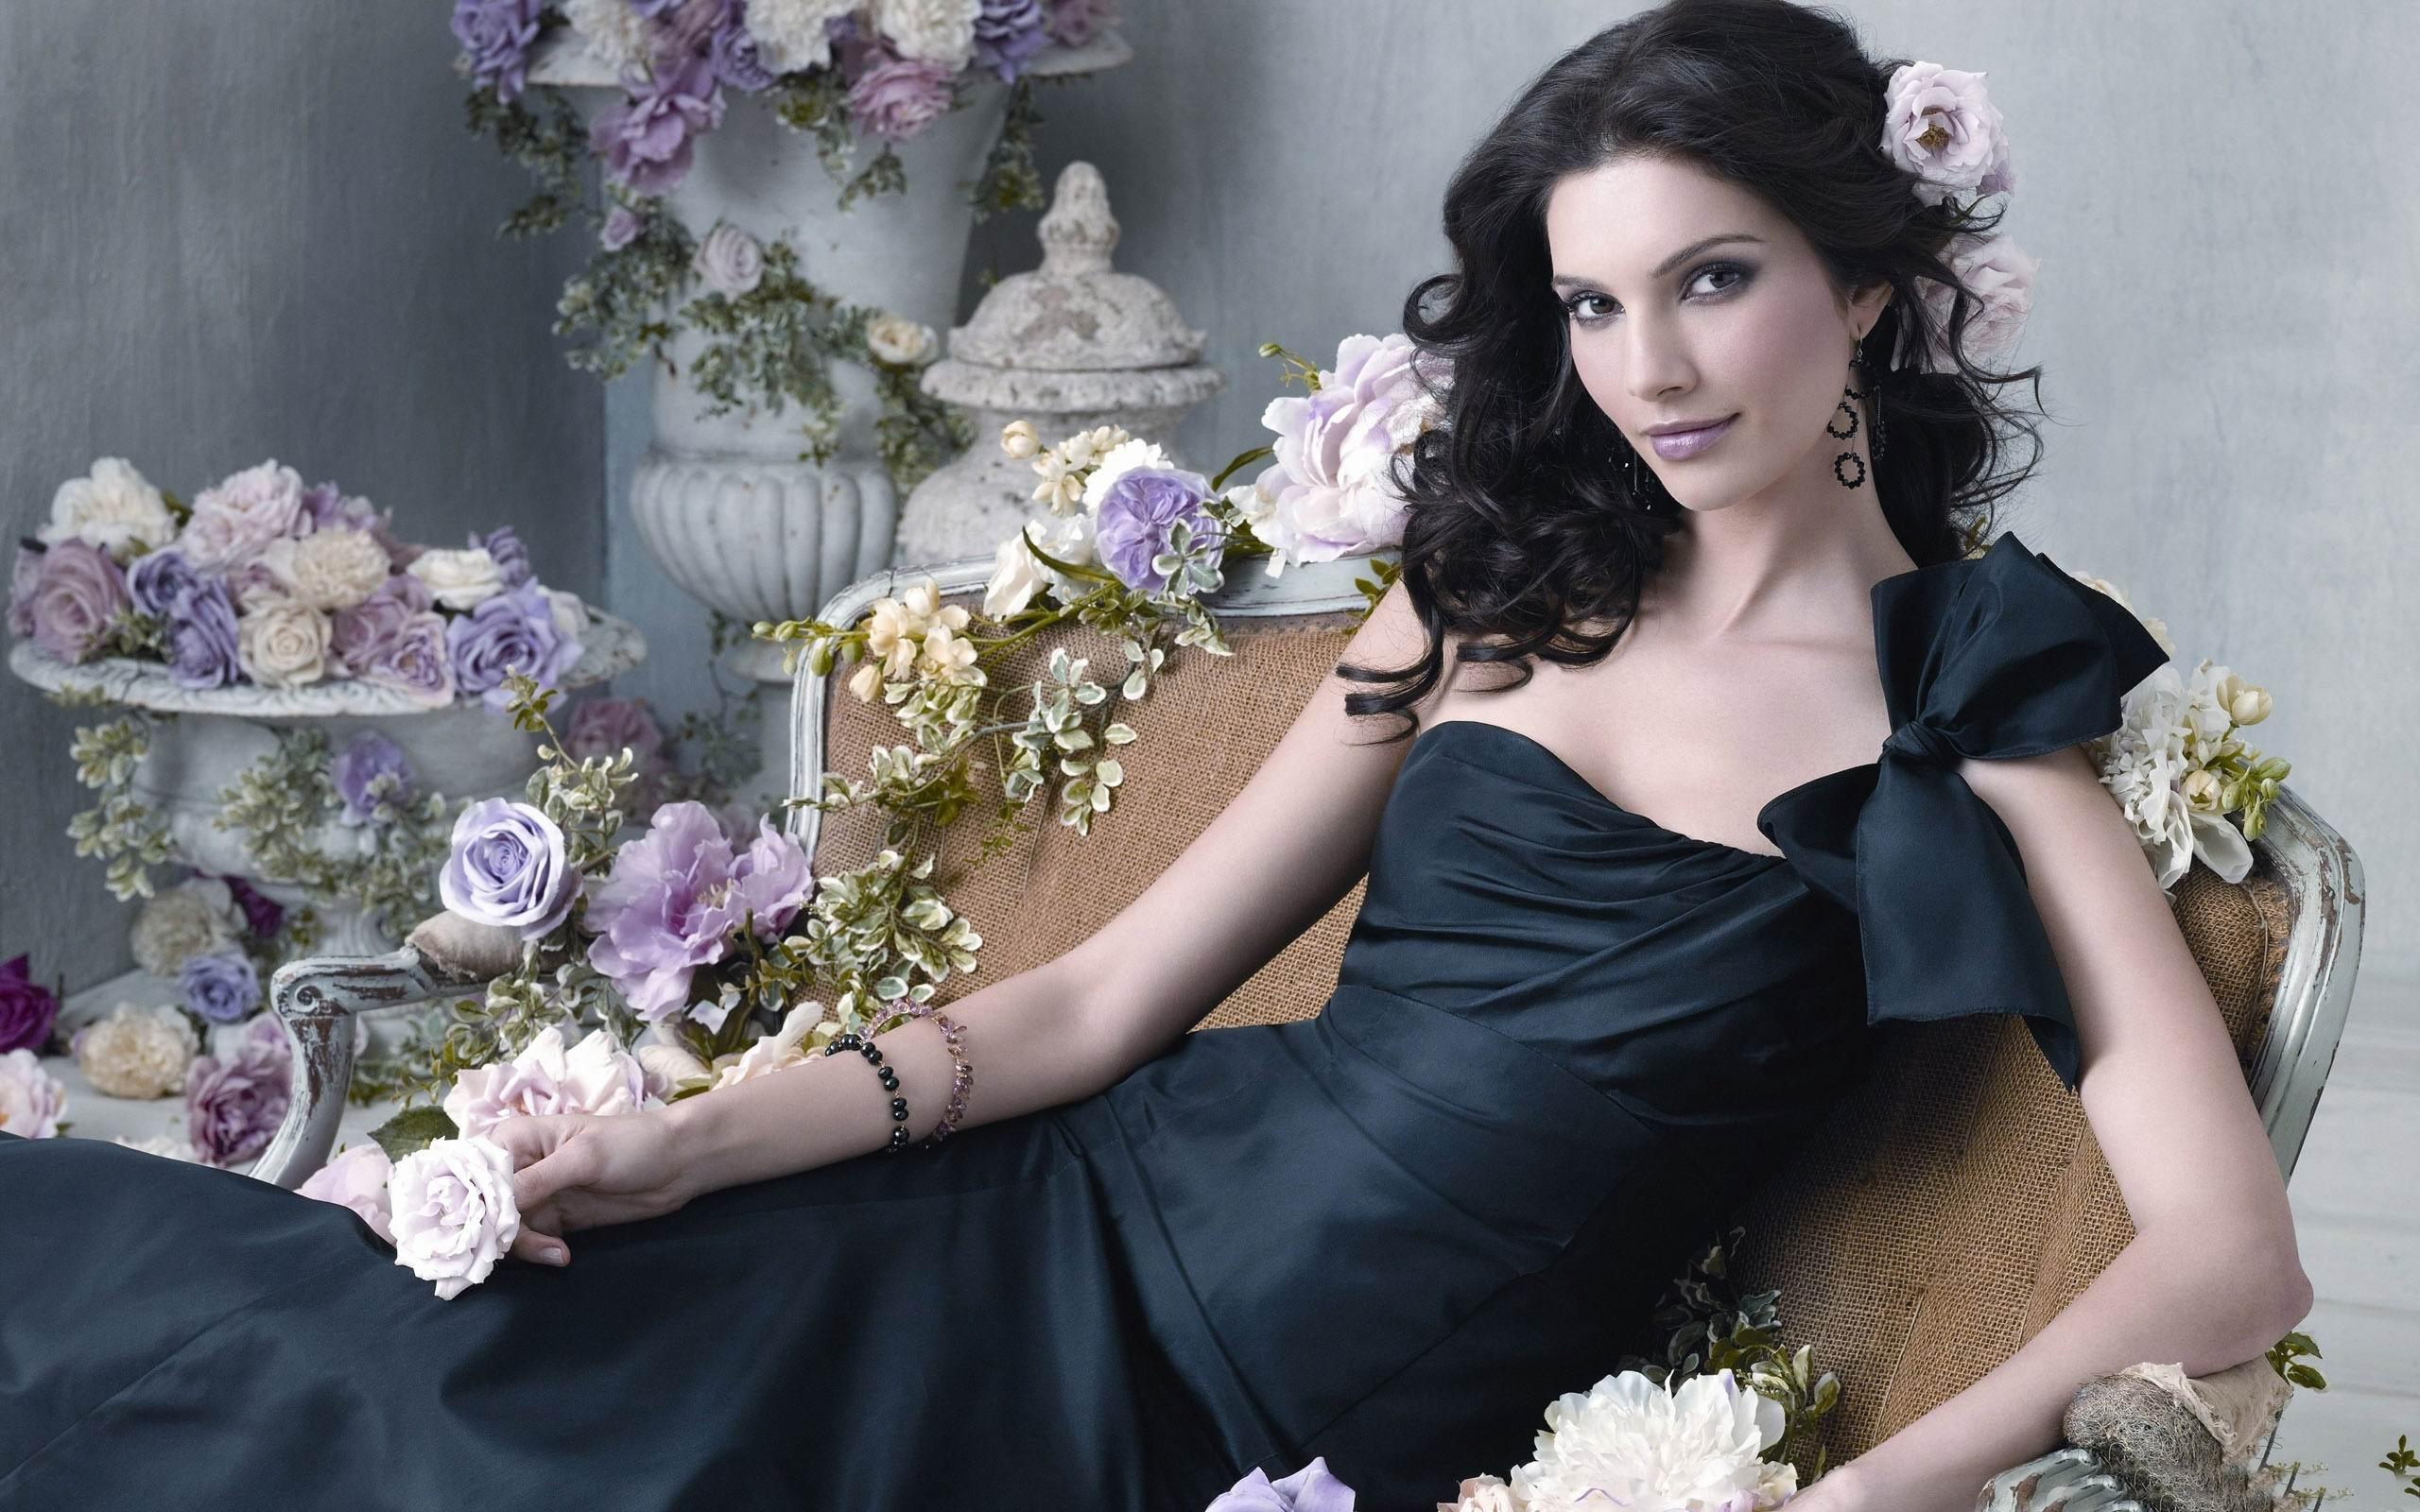 Teresa moore sexy — photo 15